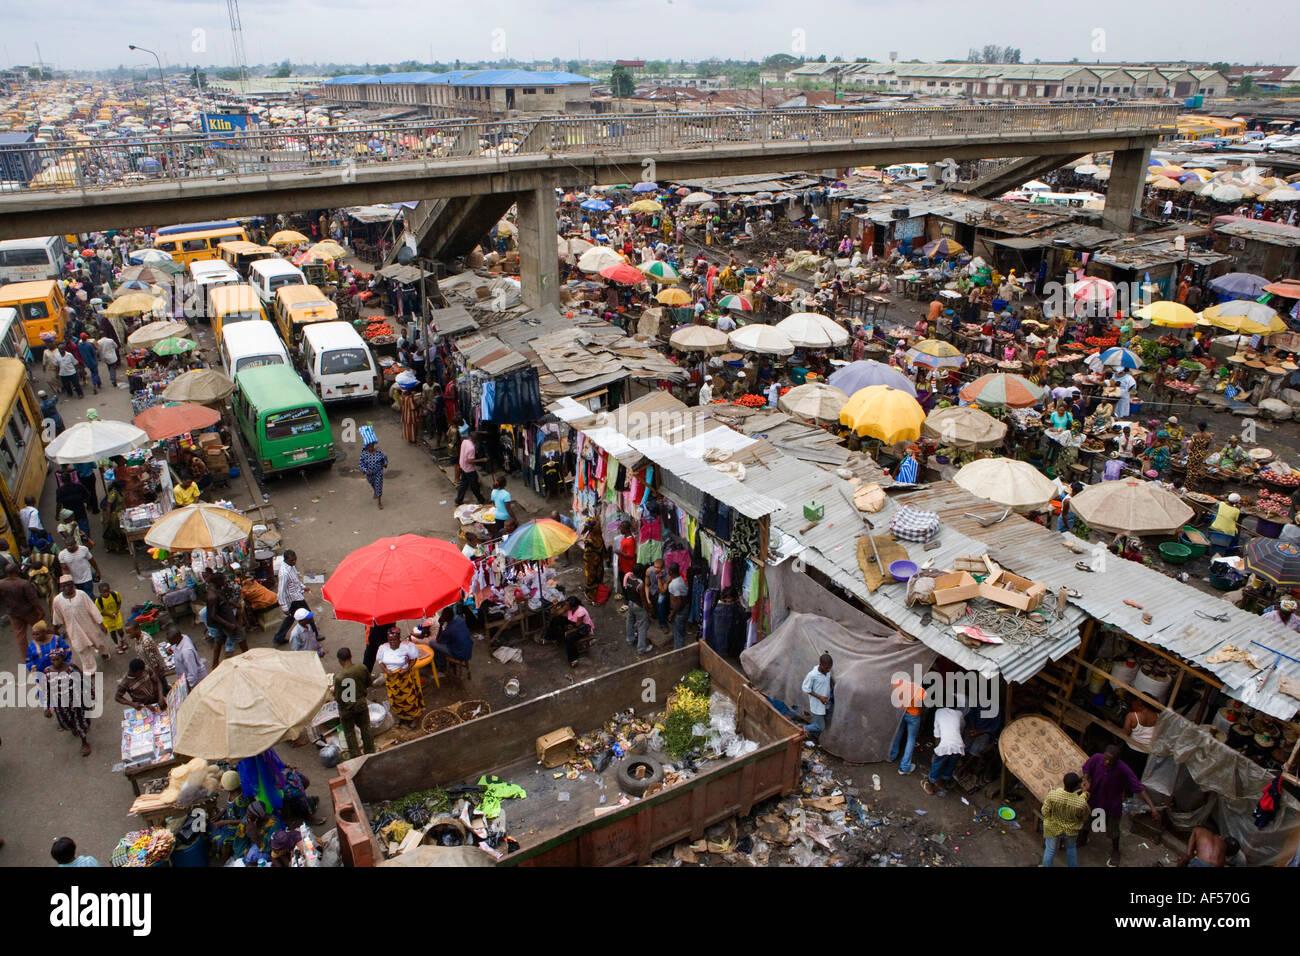 Nigeria Lagos People at market in Oshidin district - Stock Image